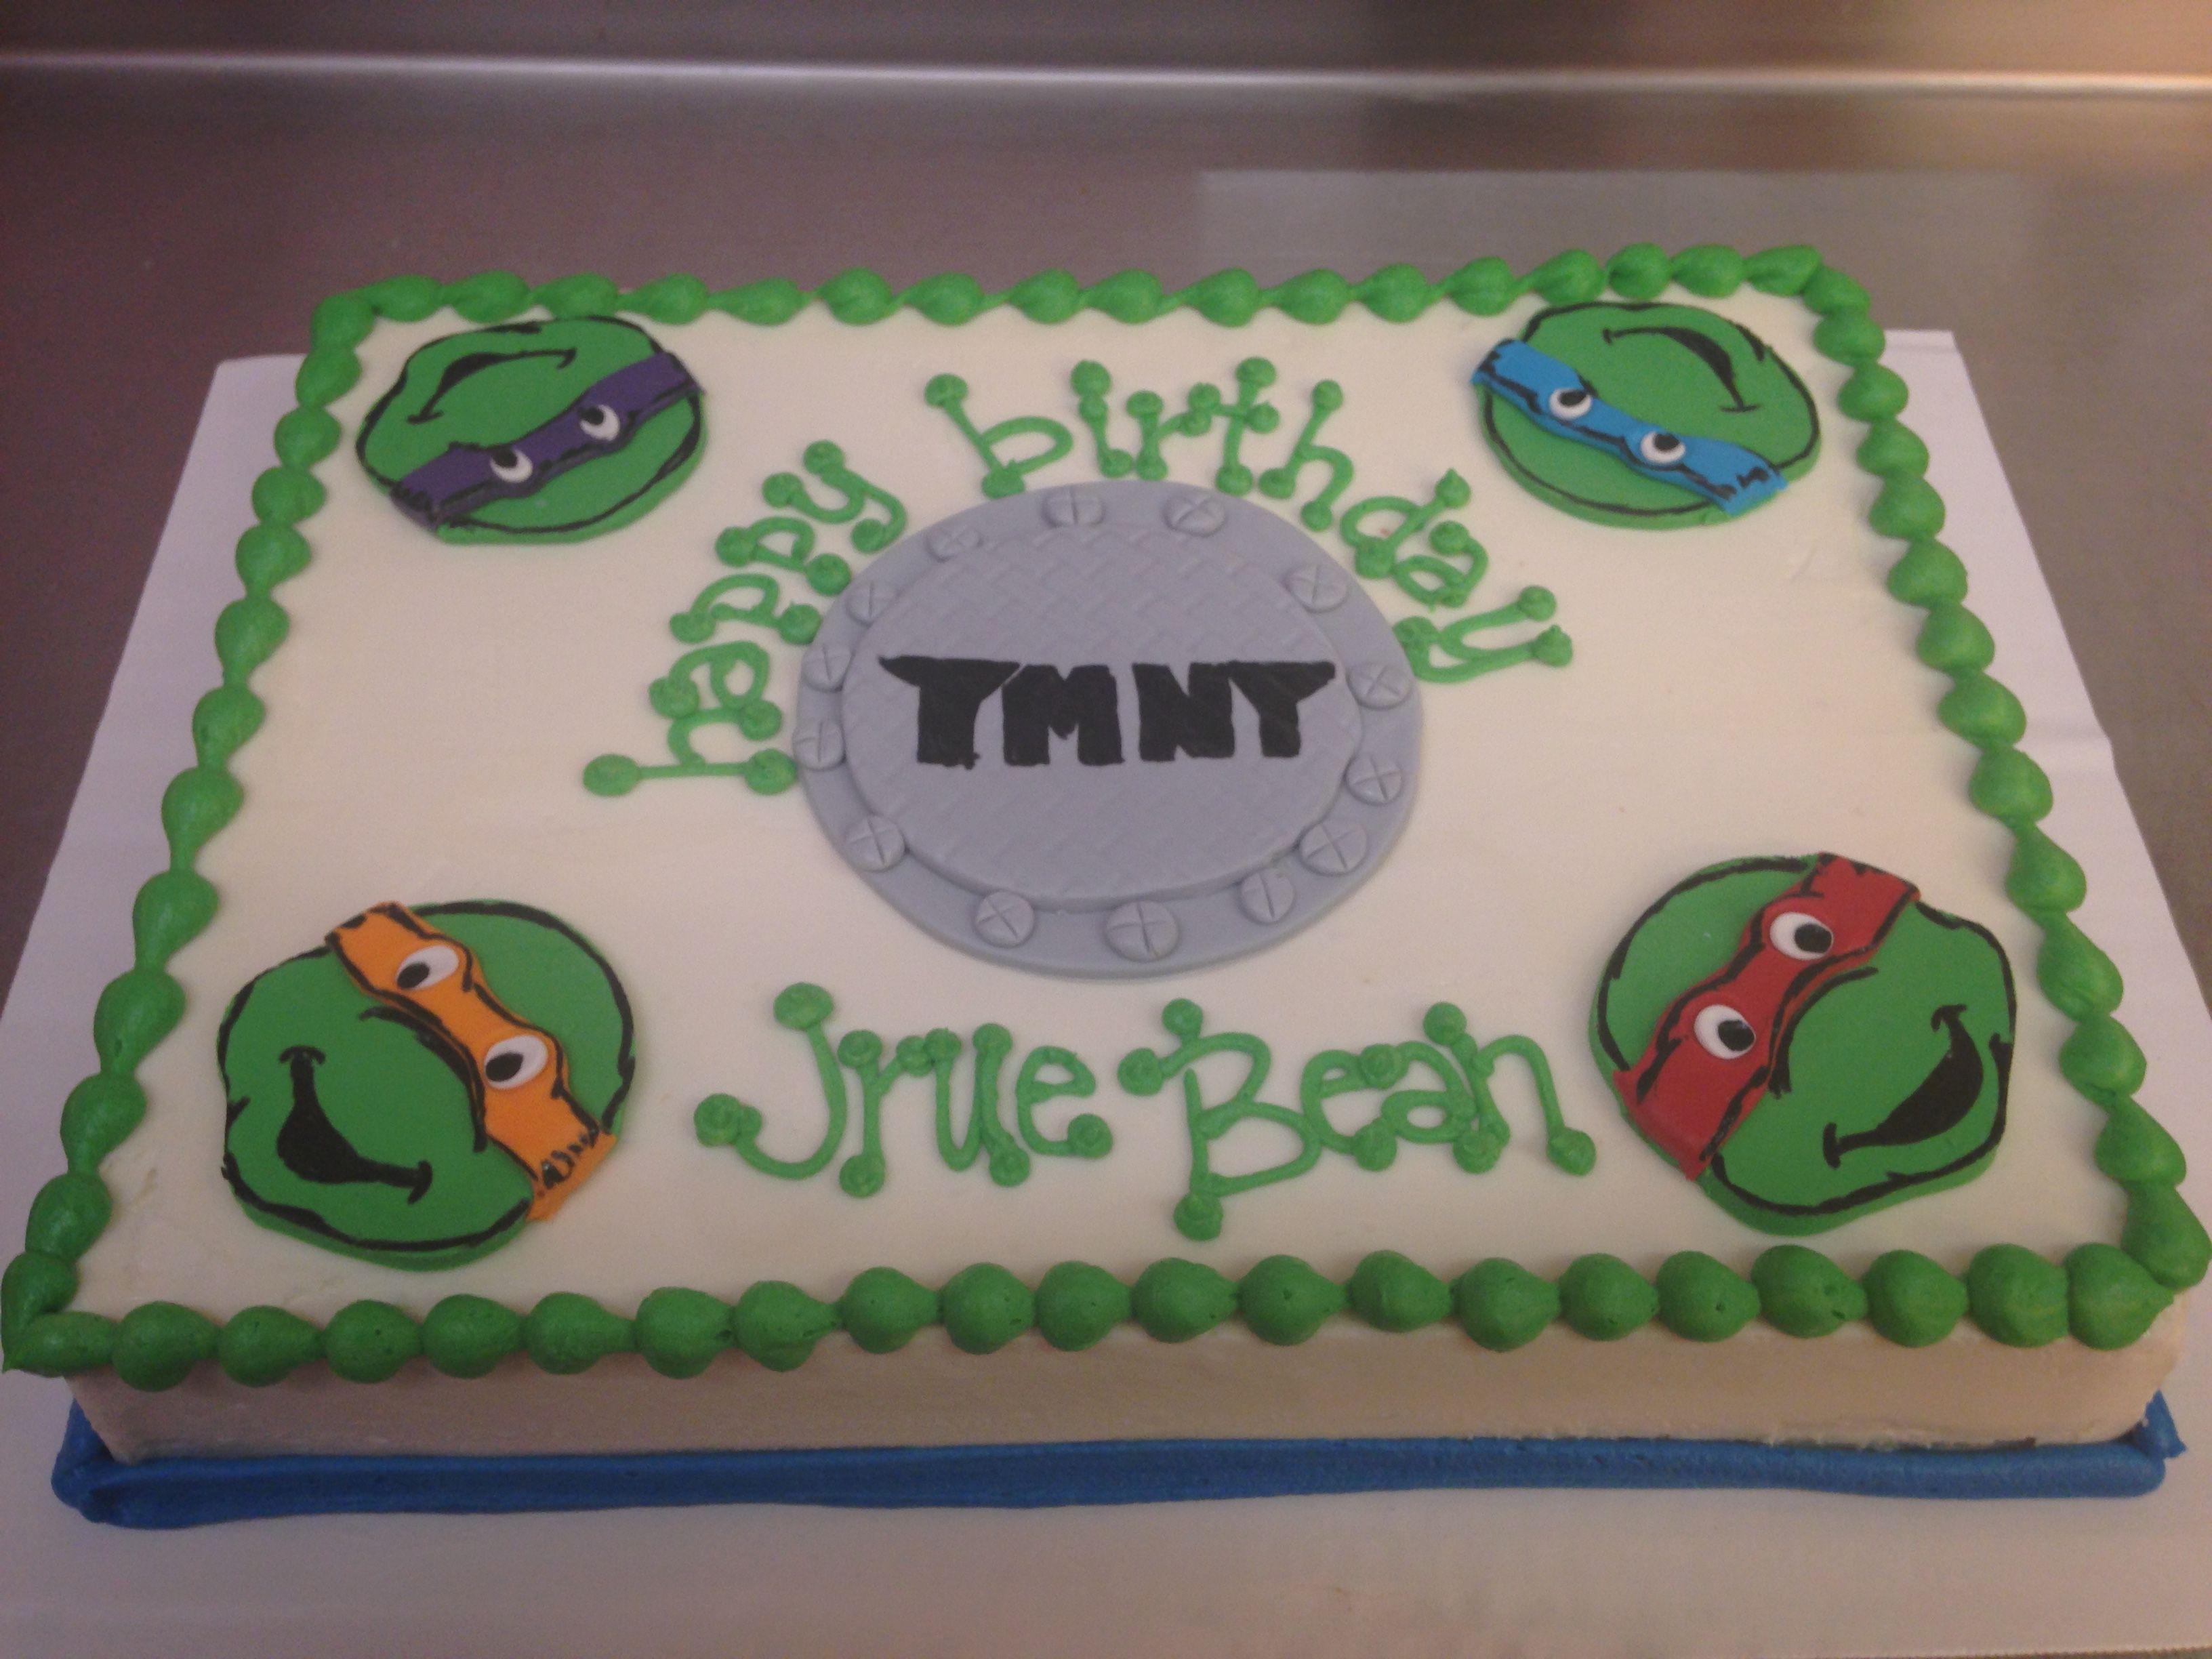 Ninja turtles sheet cake Bake Me Happy Www.bakemehappy.net ...